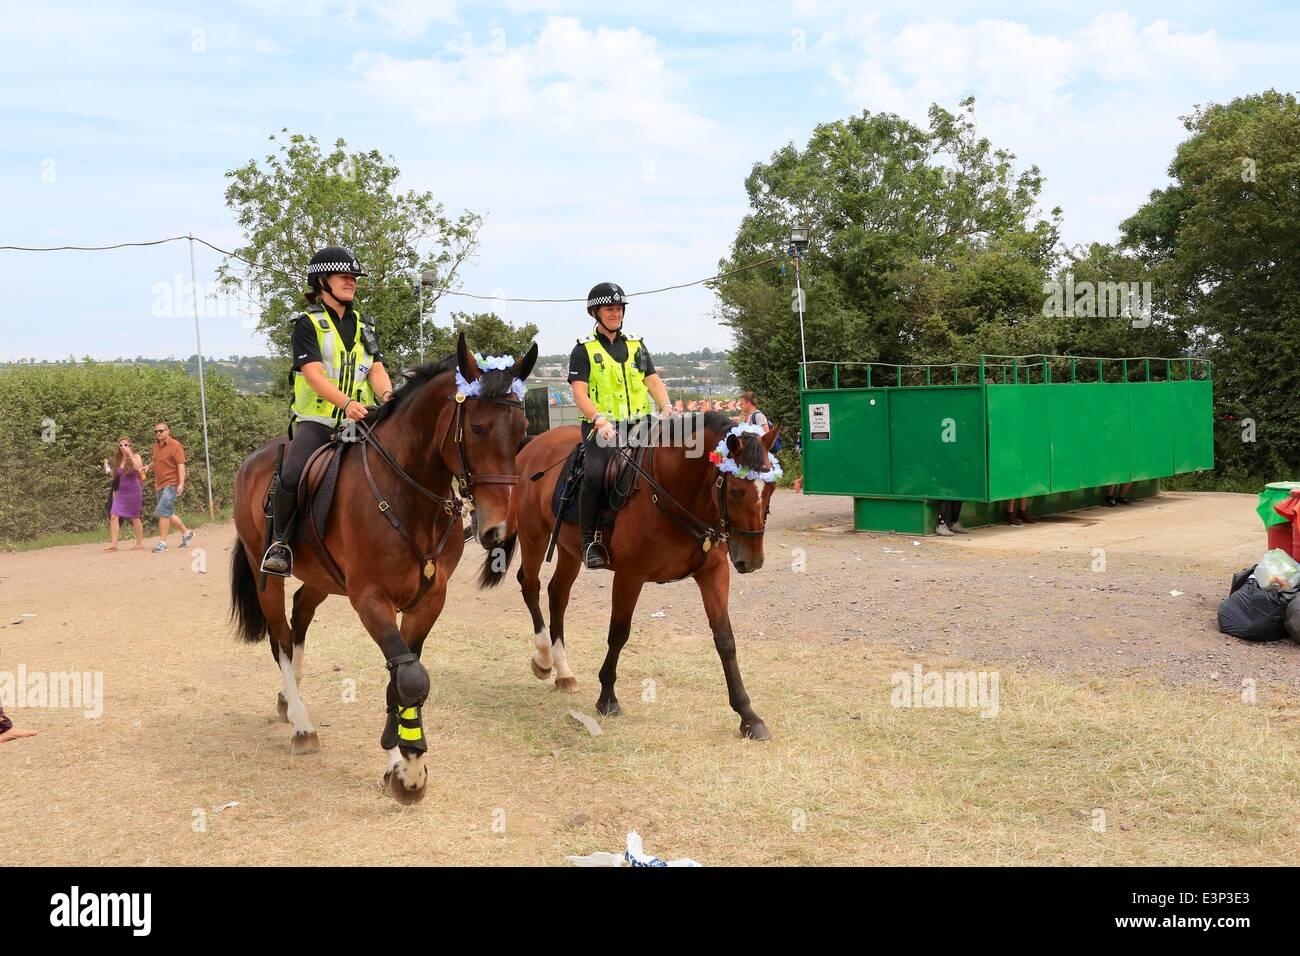 Glastonbury Festival, Glastonbury, Somerset, UK. 26th June, 2014. Mounted police patrol the festival site as festival - Stock Image